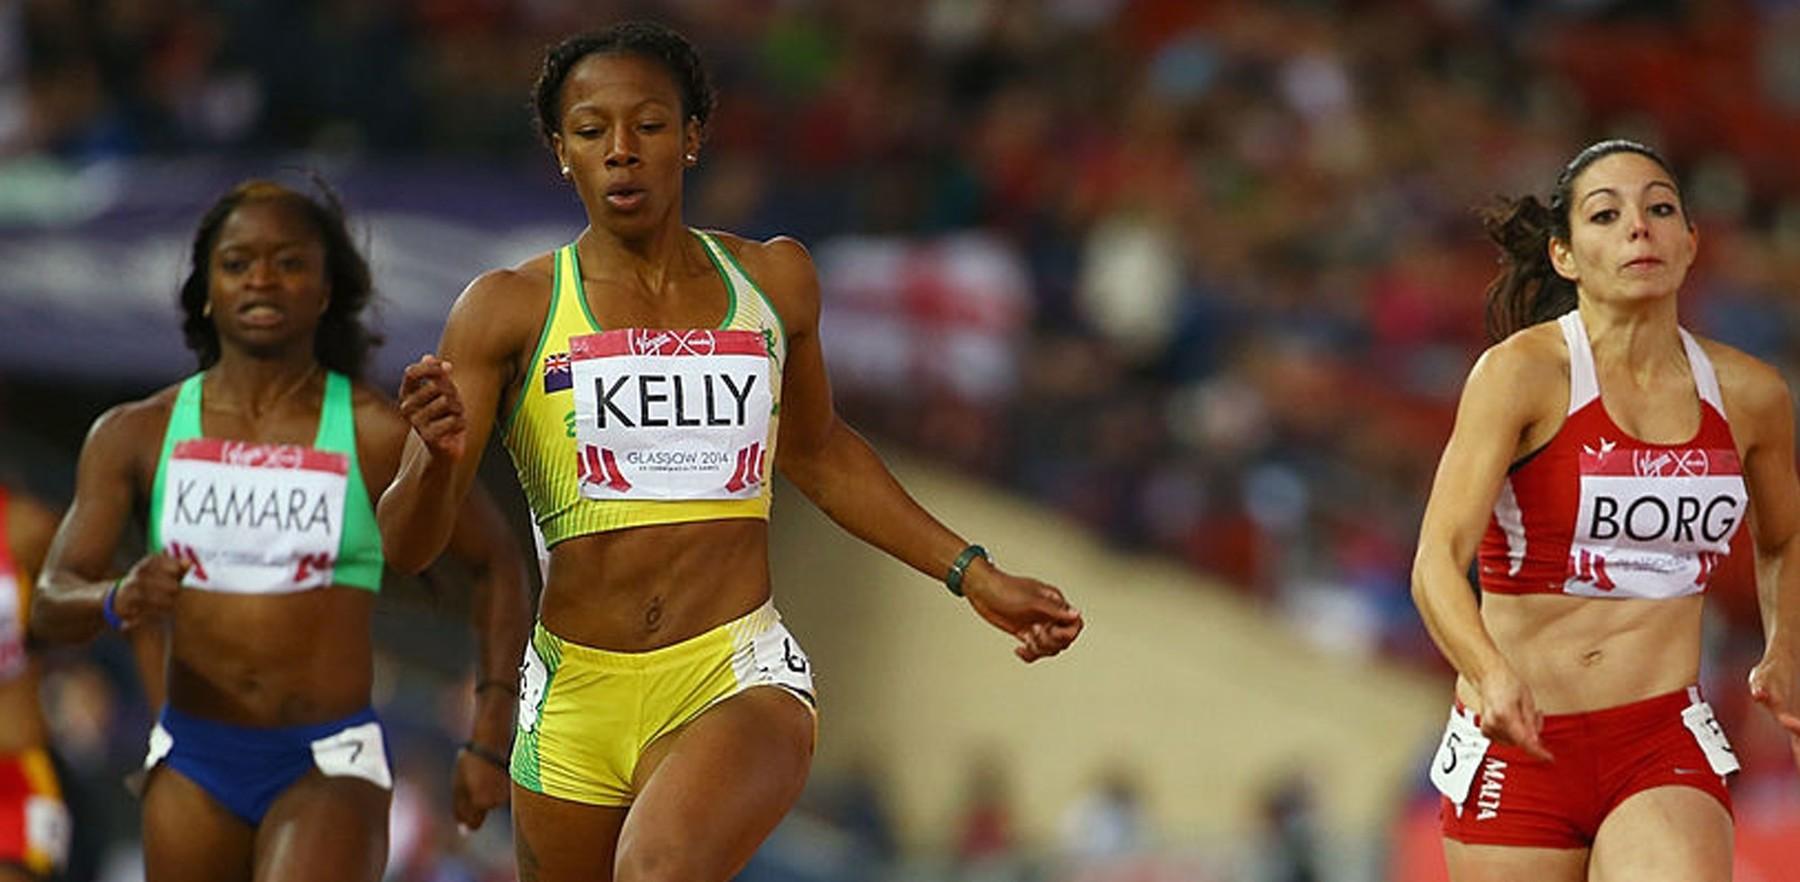 image of sprinter Ashley Kelly